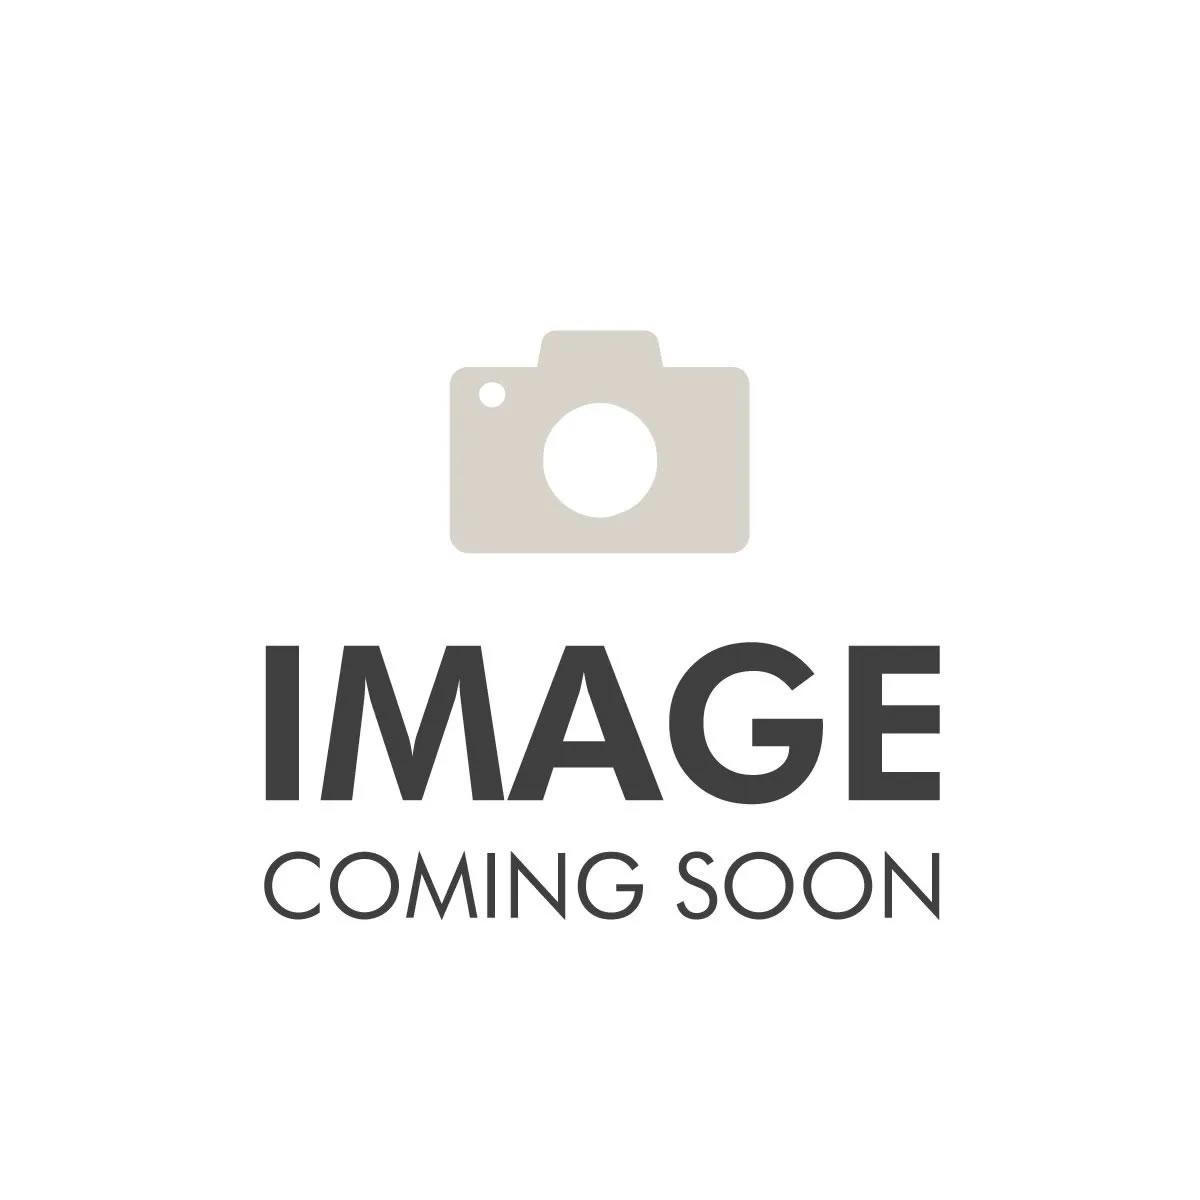 6 Inch Round Halogen Light kit, Set of 3, Black;